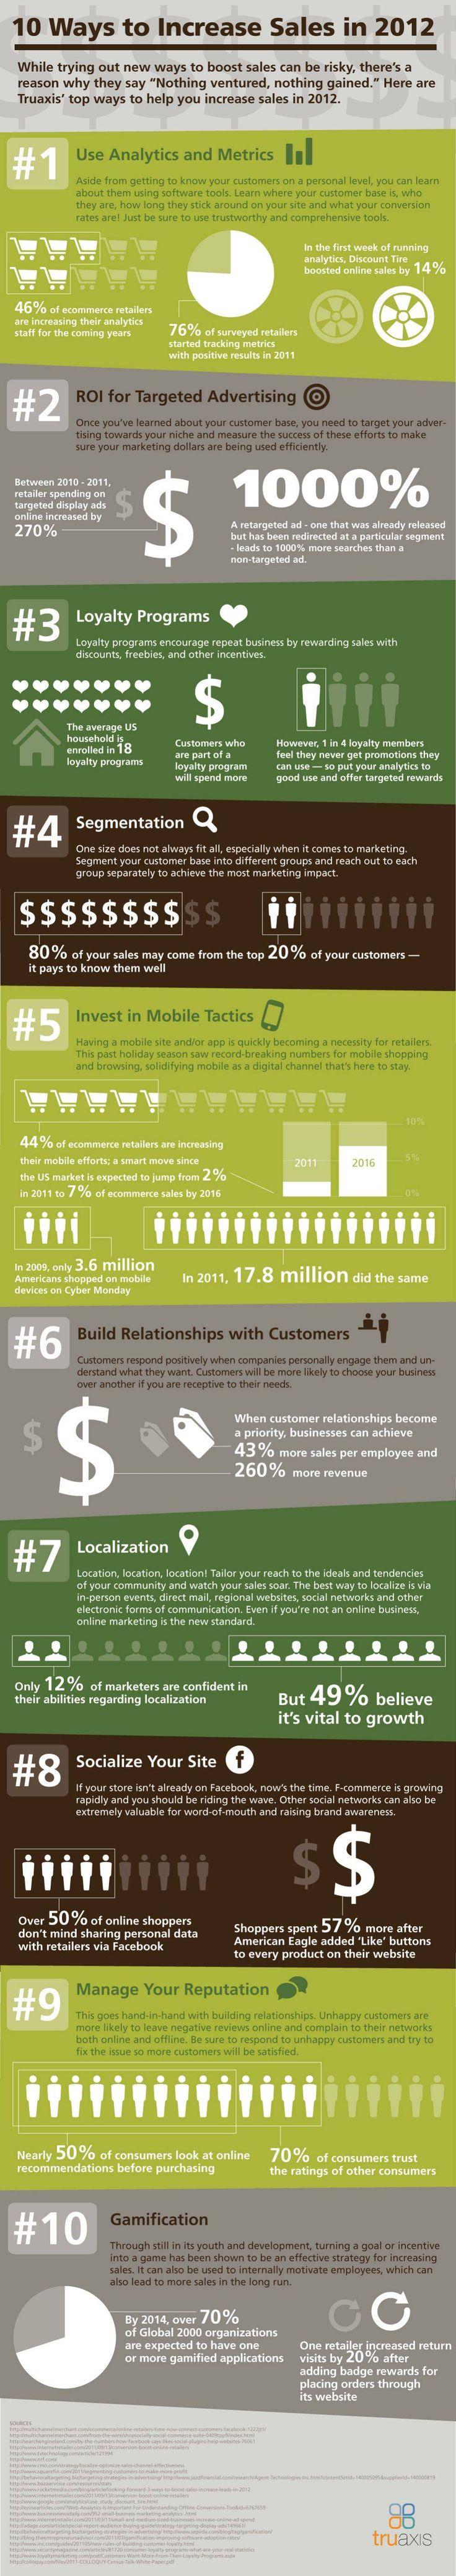 10 maneras de incrementar ventas en 2012. #infografia #infographic